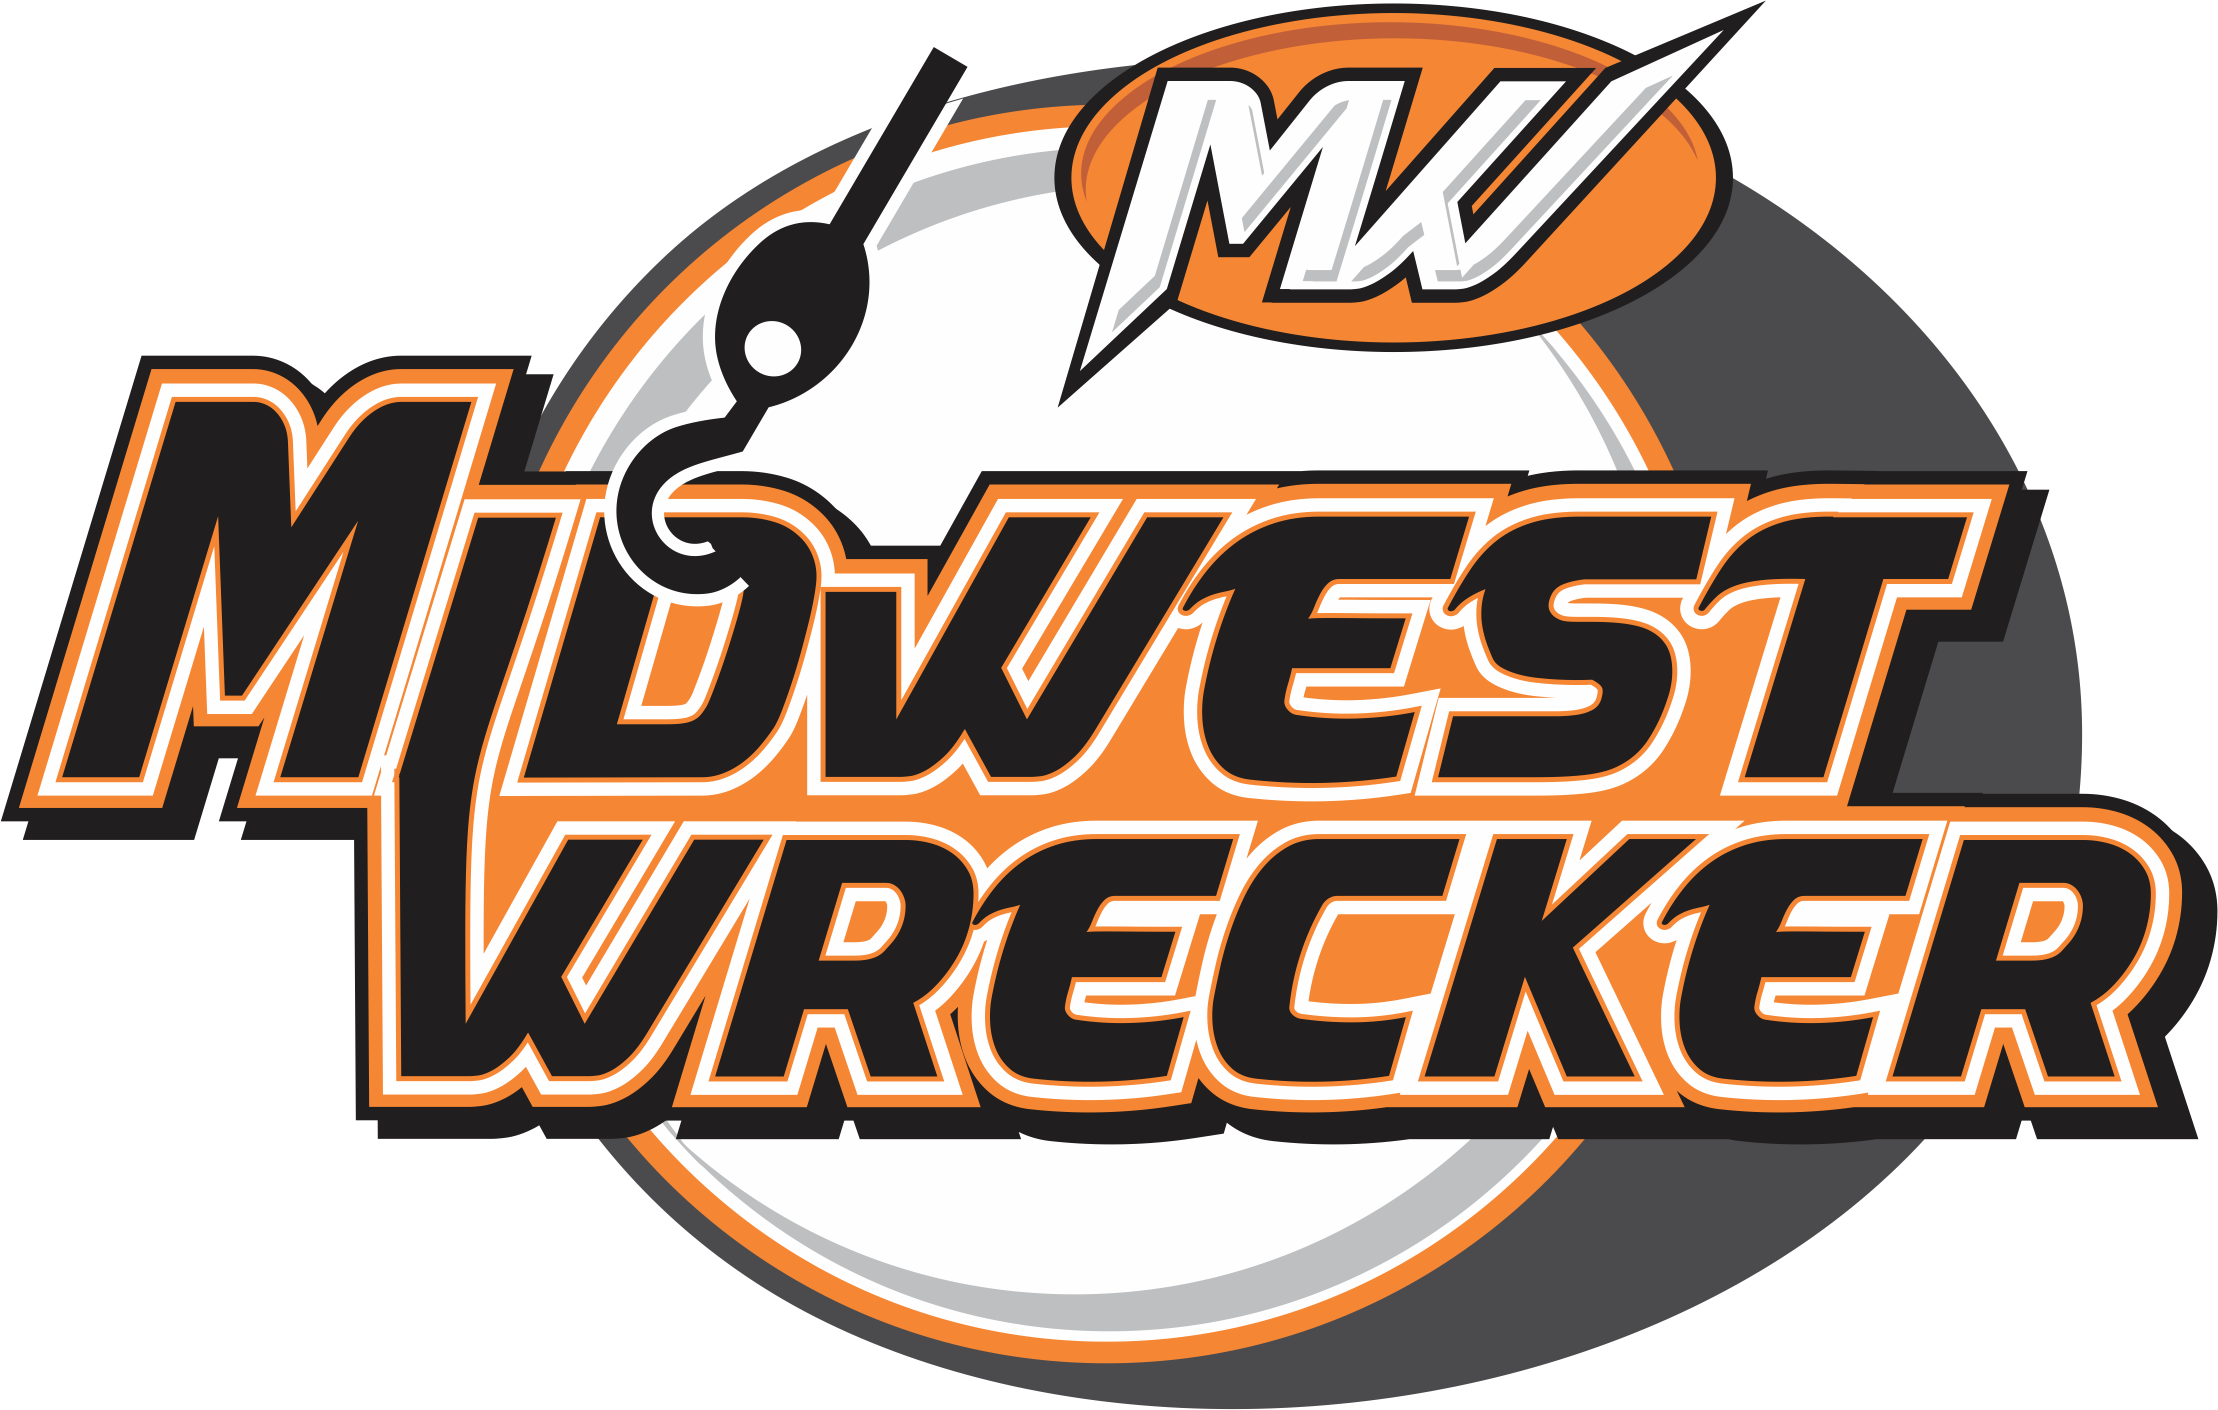 Midwest Wrecker